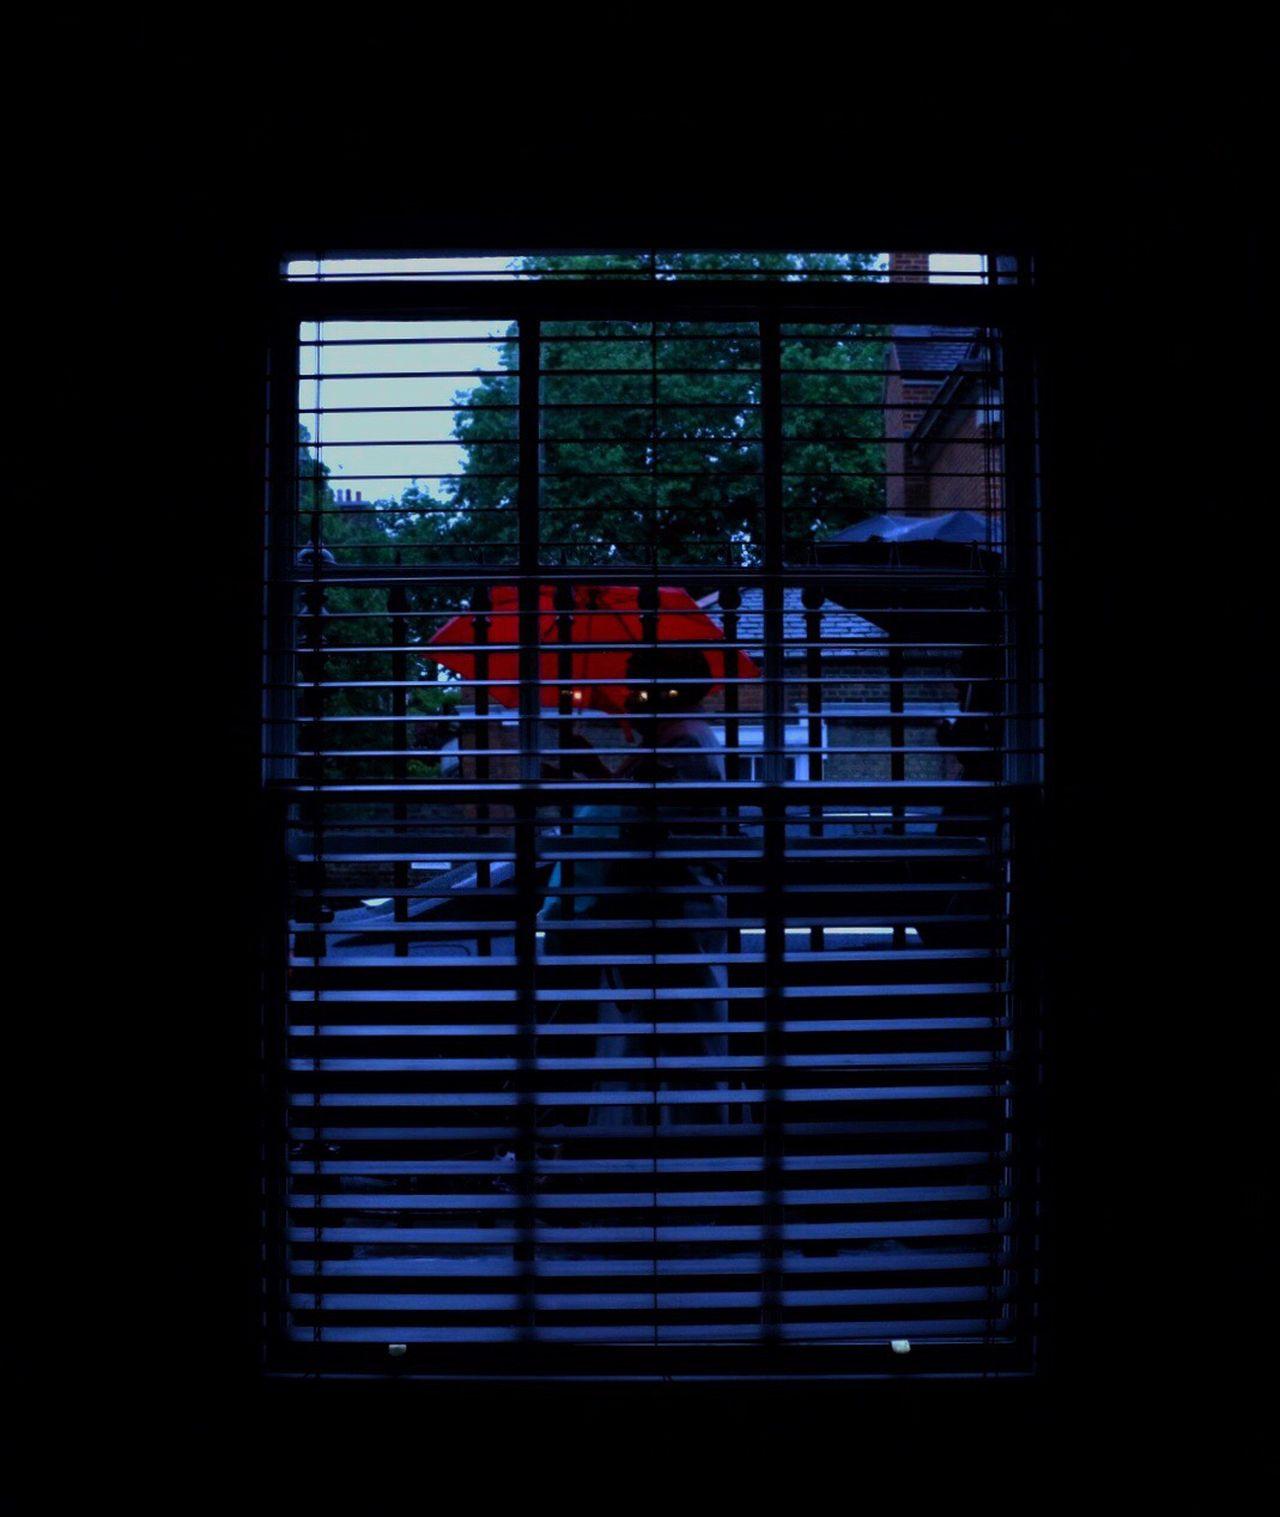 Night Indoors  Technology No People Illuminated Close-up EyeEm Best Shots The Street Photographer - 2017 EyeEm Awards Outdoors Eyem Best Shots Unbrella Rain Rainy Rainy Days Frame Window Window View London The Portraitist - 2017 EyeEm Awards